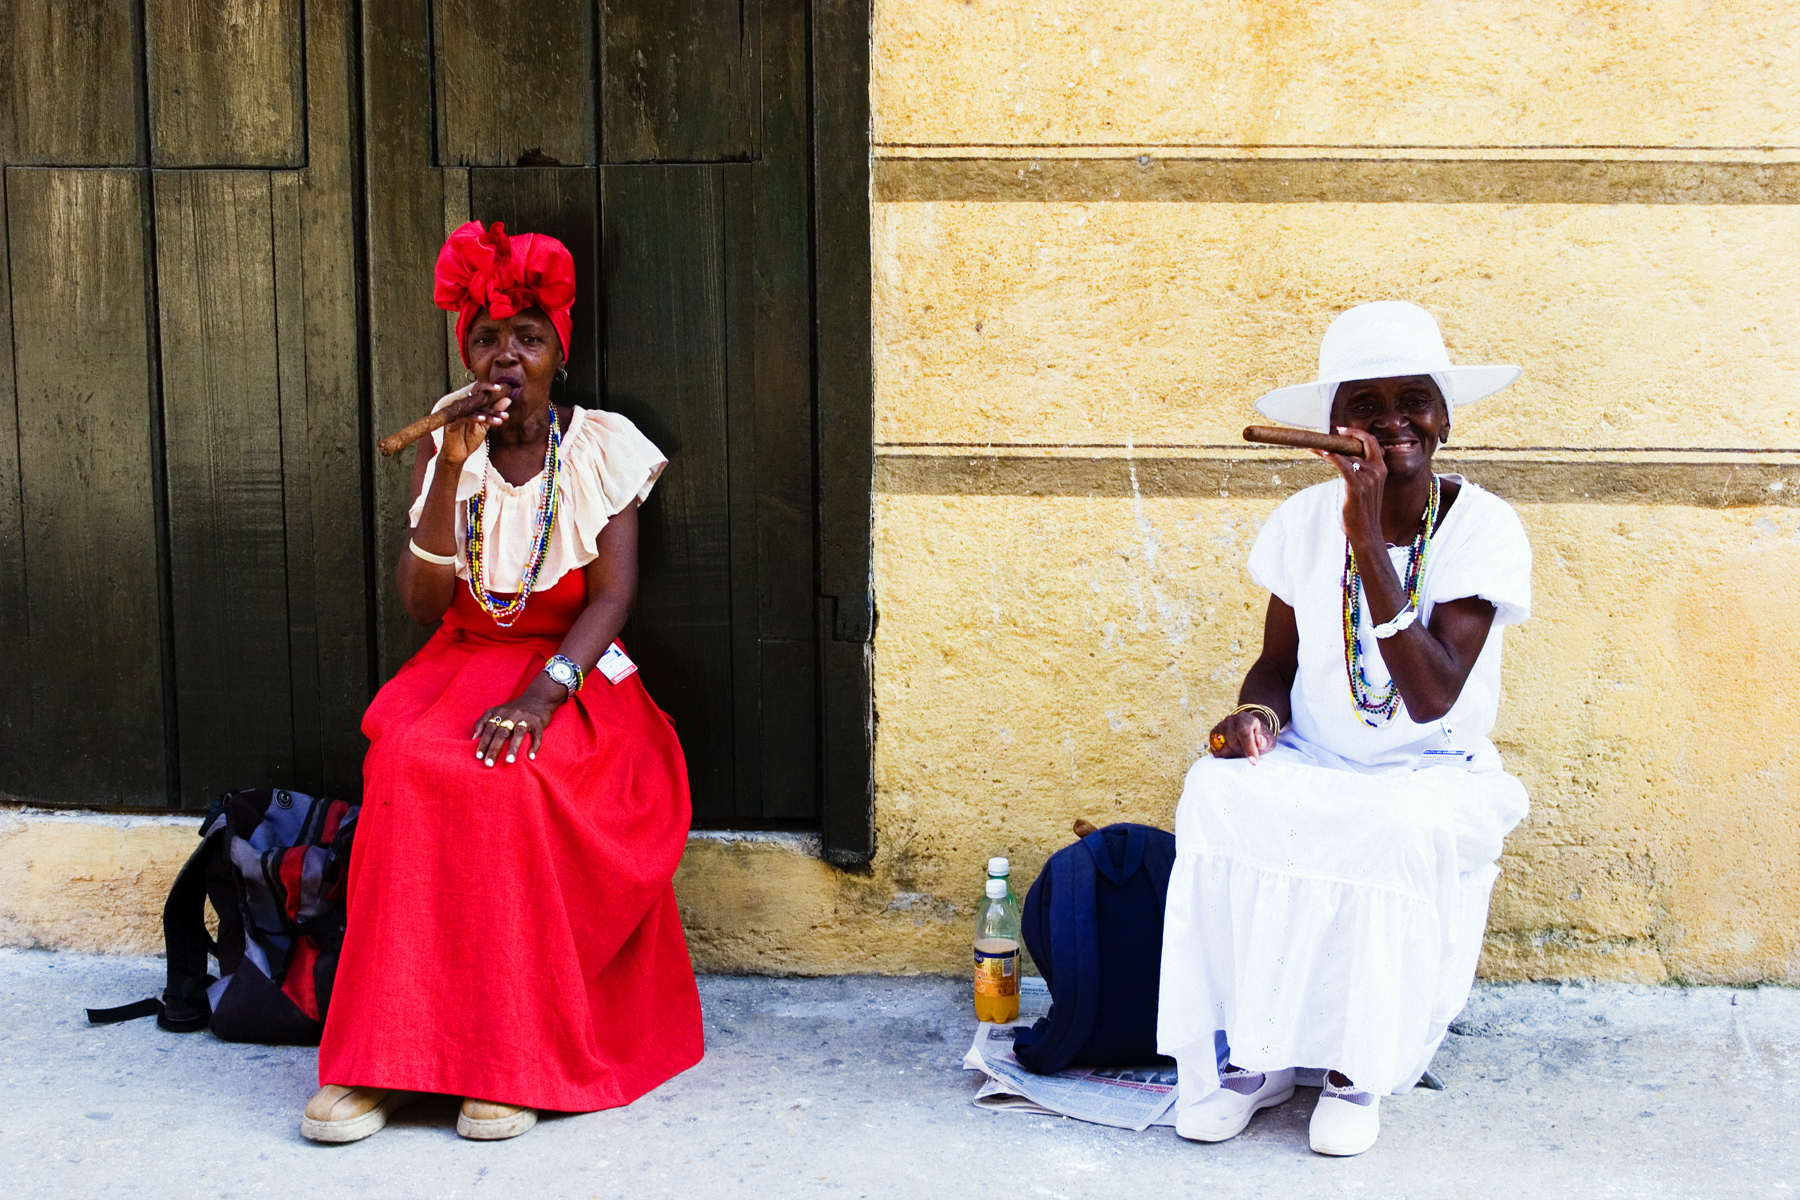 Characters in havana cuba davidlansing com